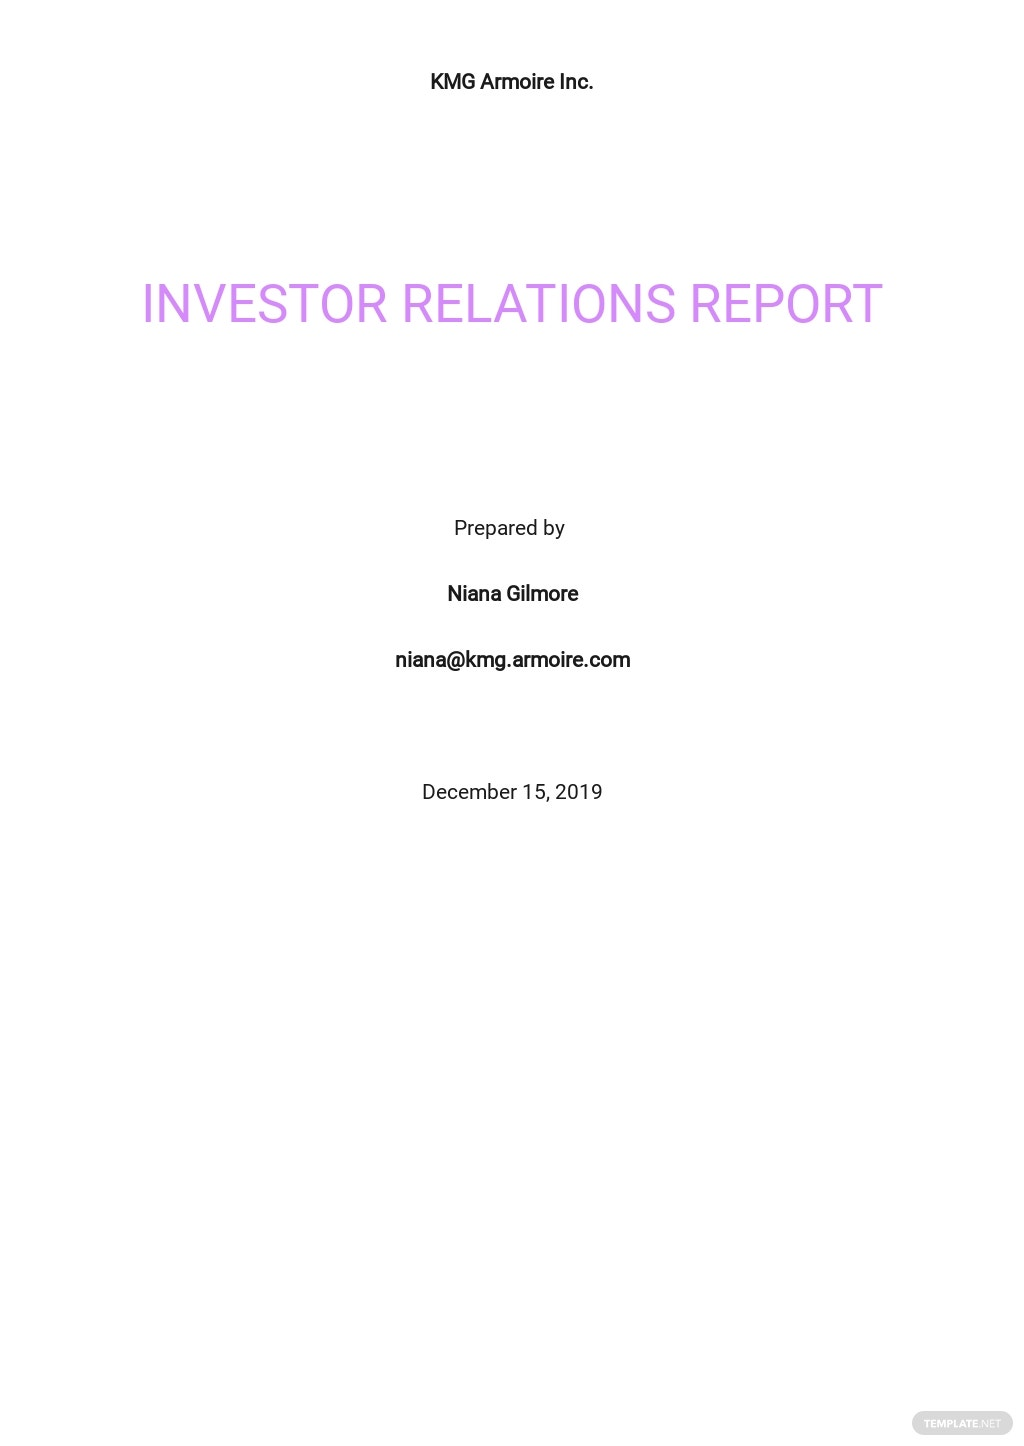 Investor Relations Report Template